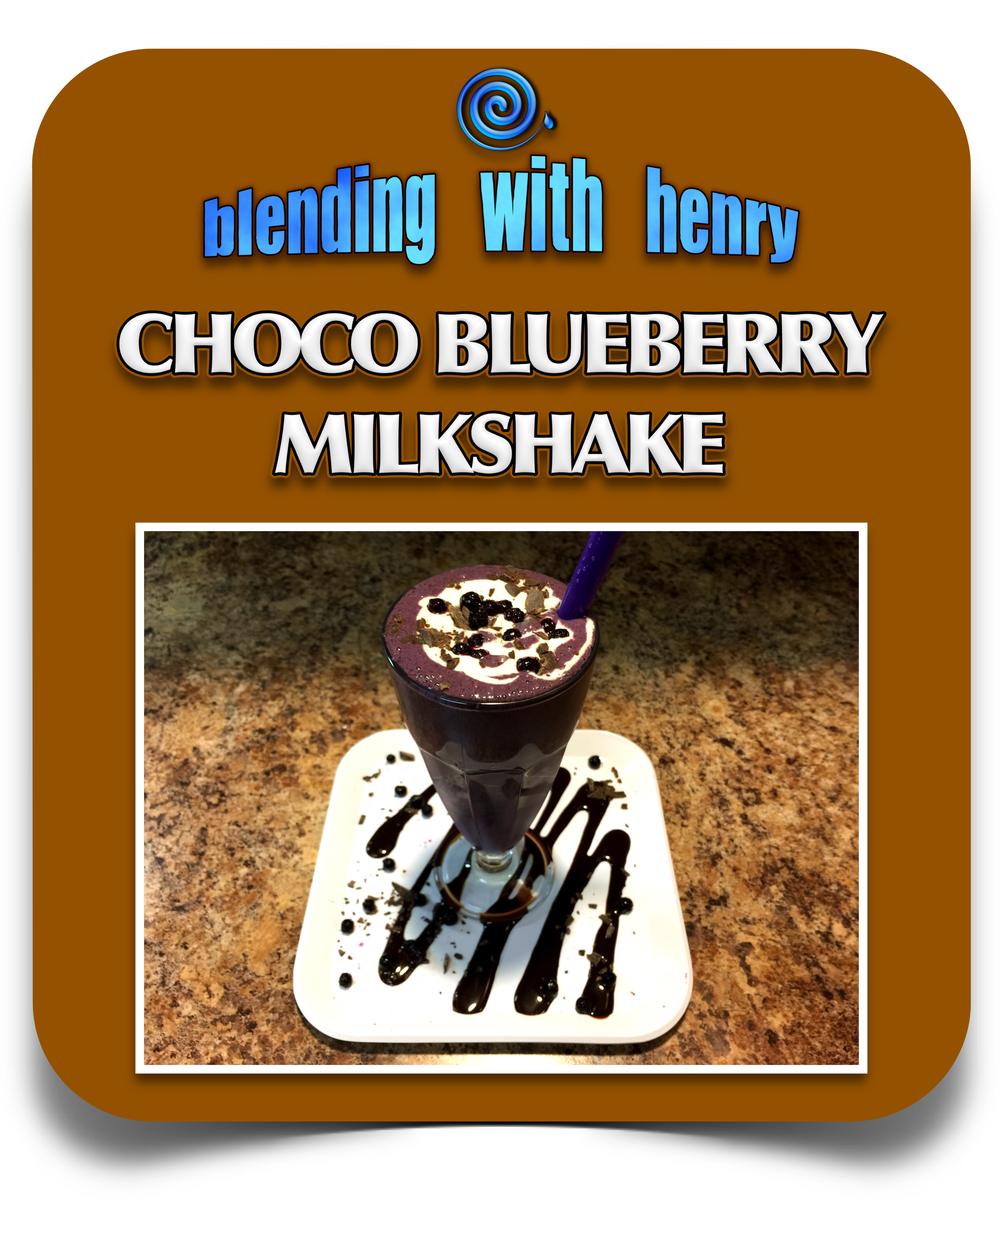 Choco Blueberry Milkshake.png